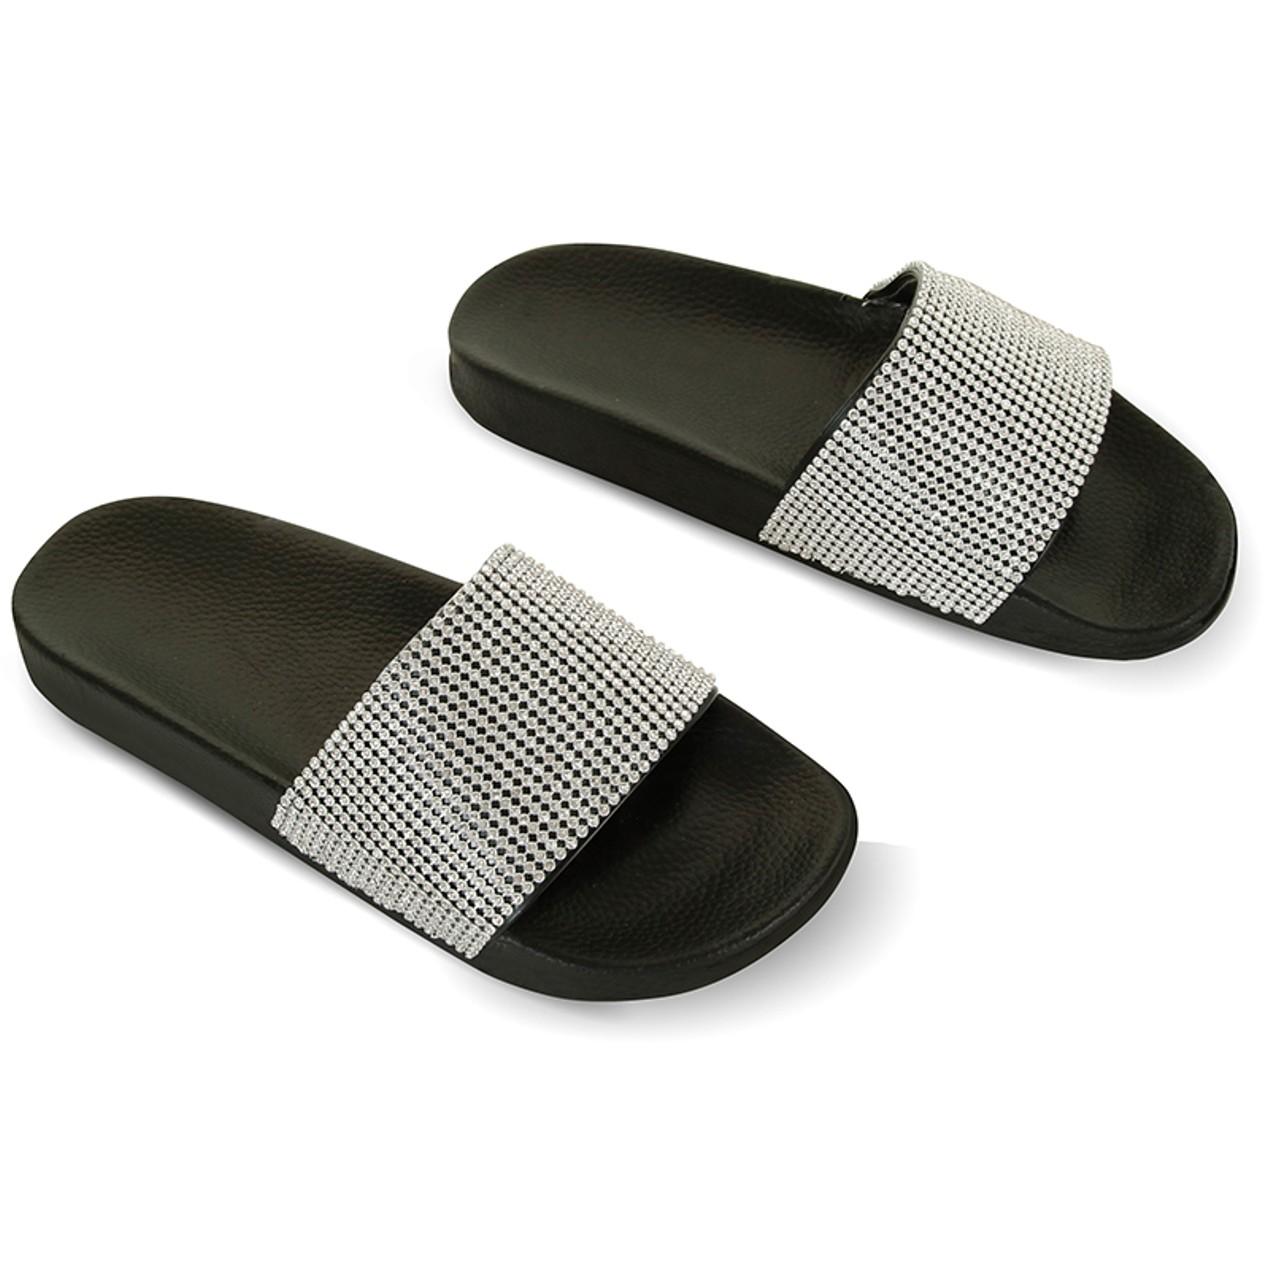 e219f64bb6afc9 Women s Chatties Rhinestone Slide Sandals Women s Chatties Rhinestone Slide  Sandals ...